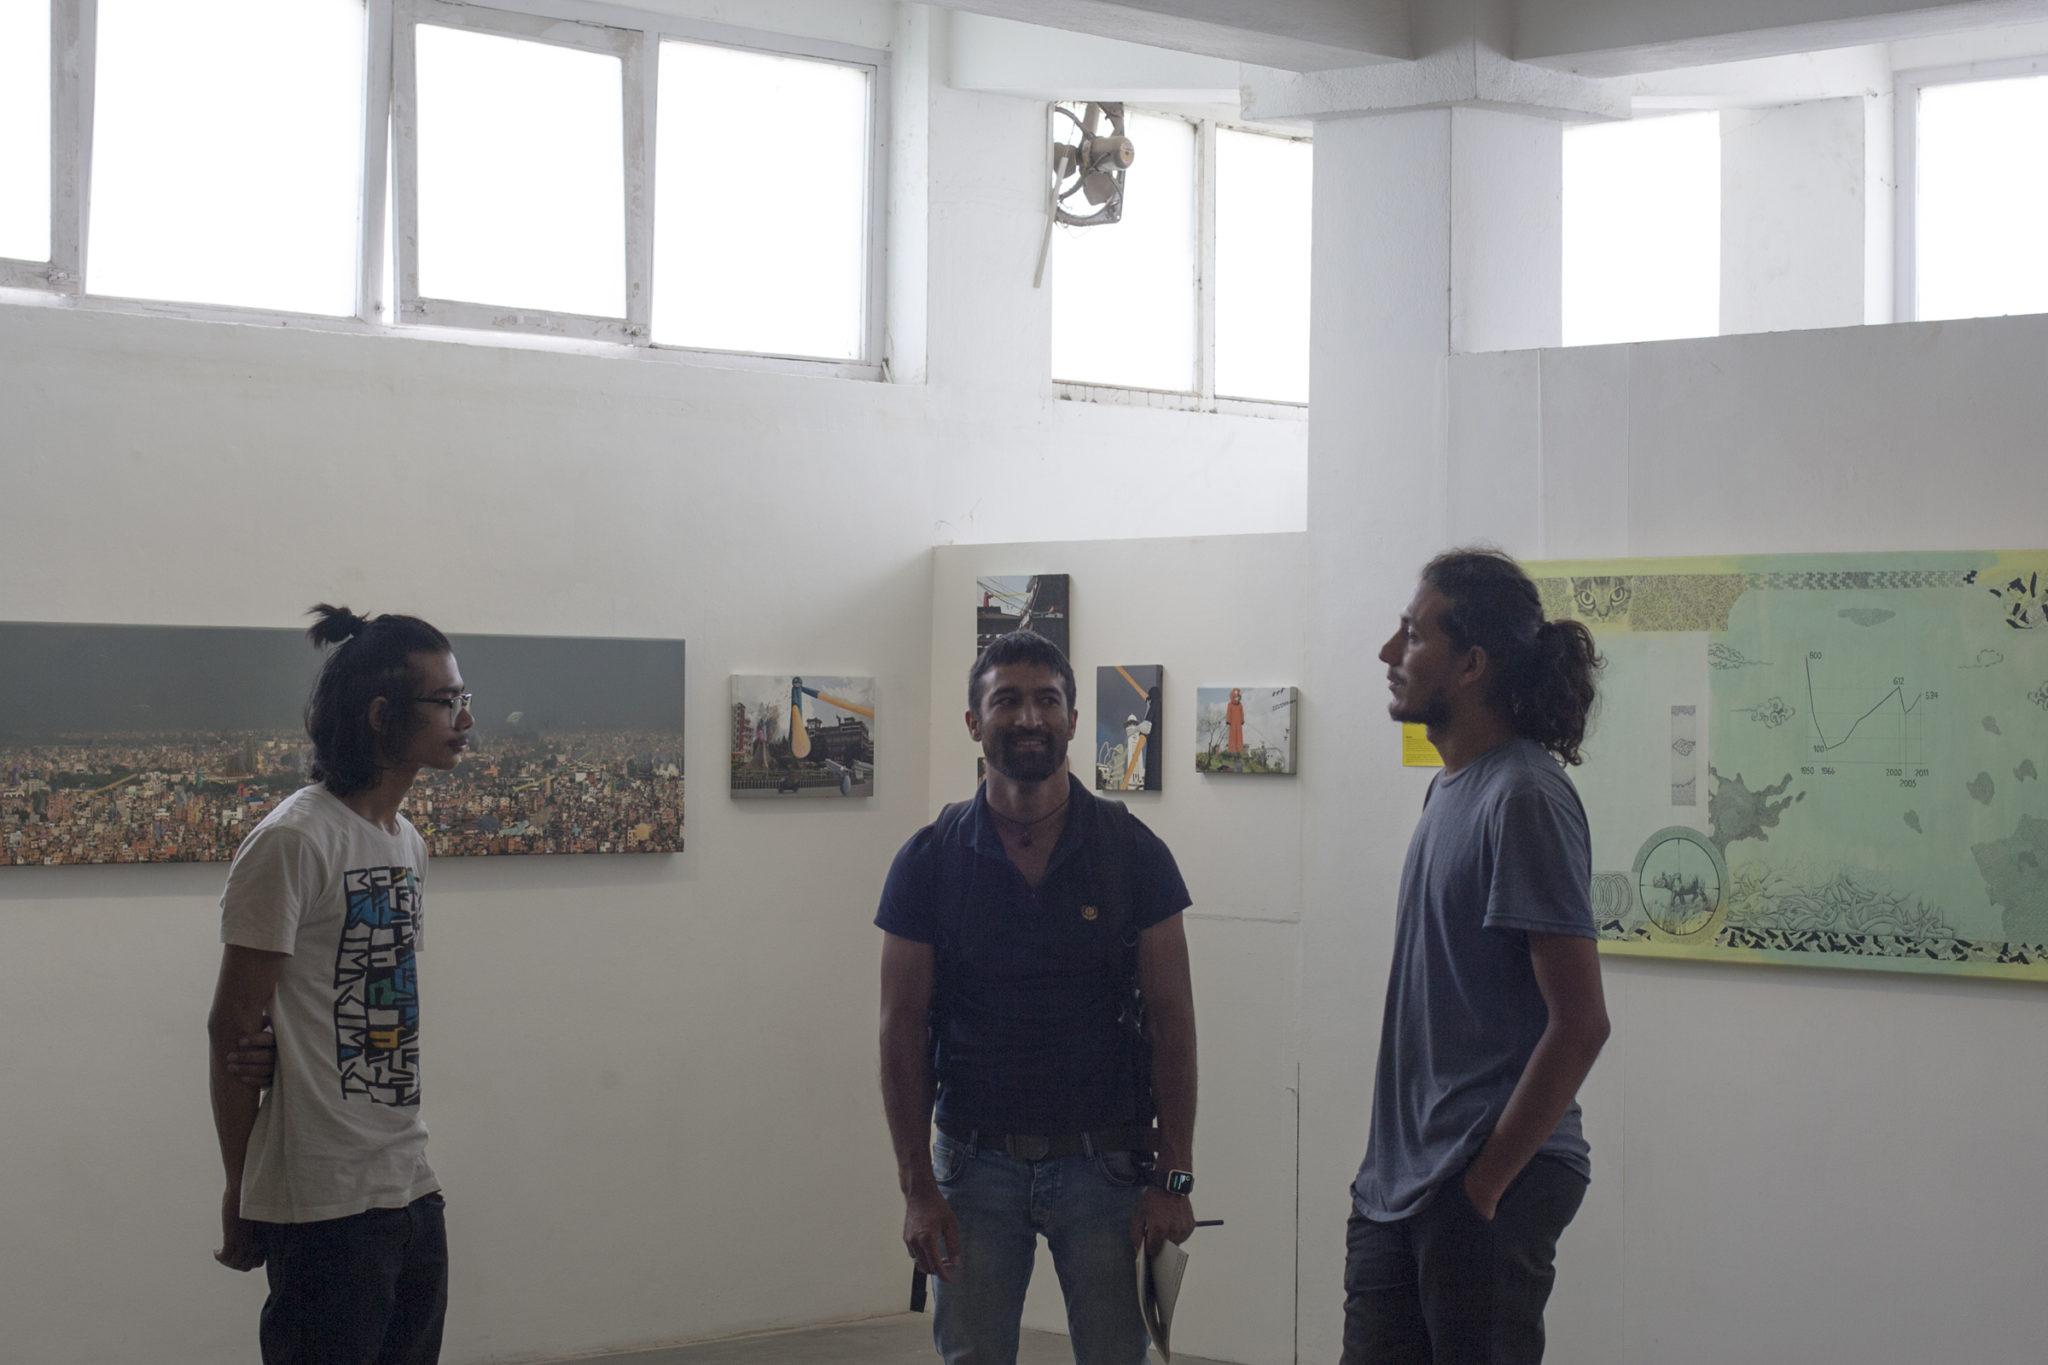 Artudio_KUart_BFA_Exhibition Project16